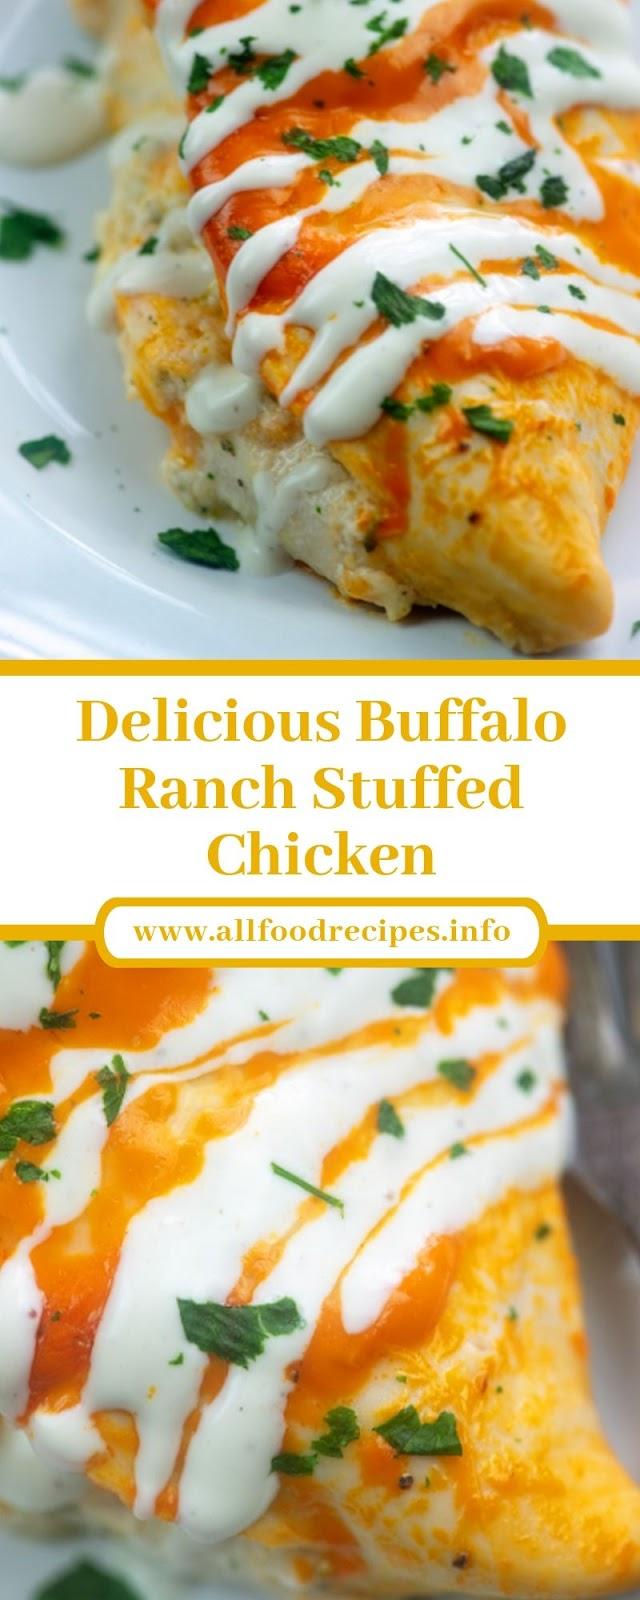 Delicious Buffalo Ranch Stuffed Chicken